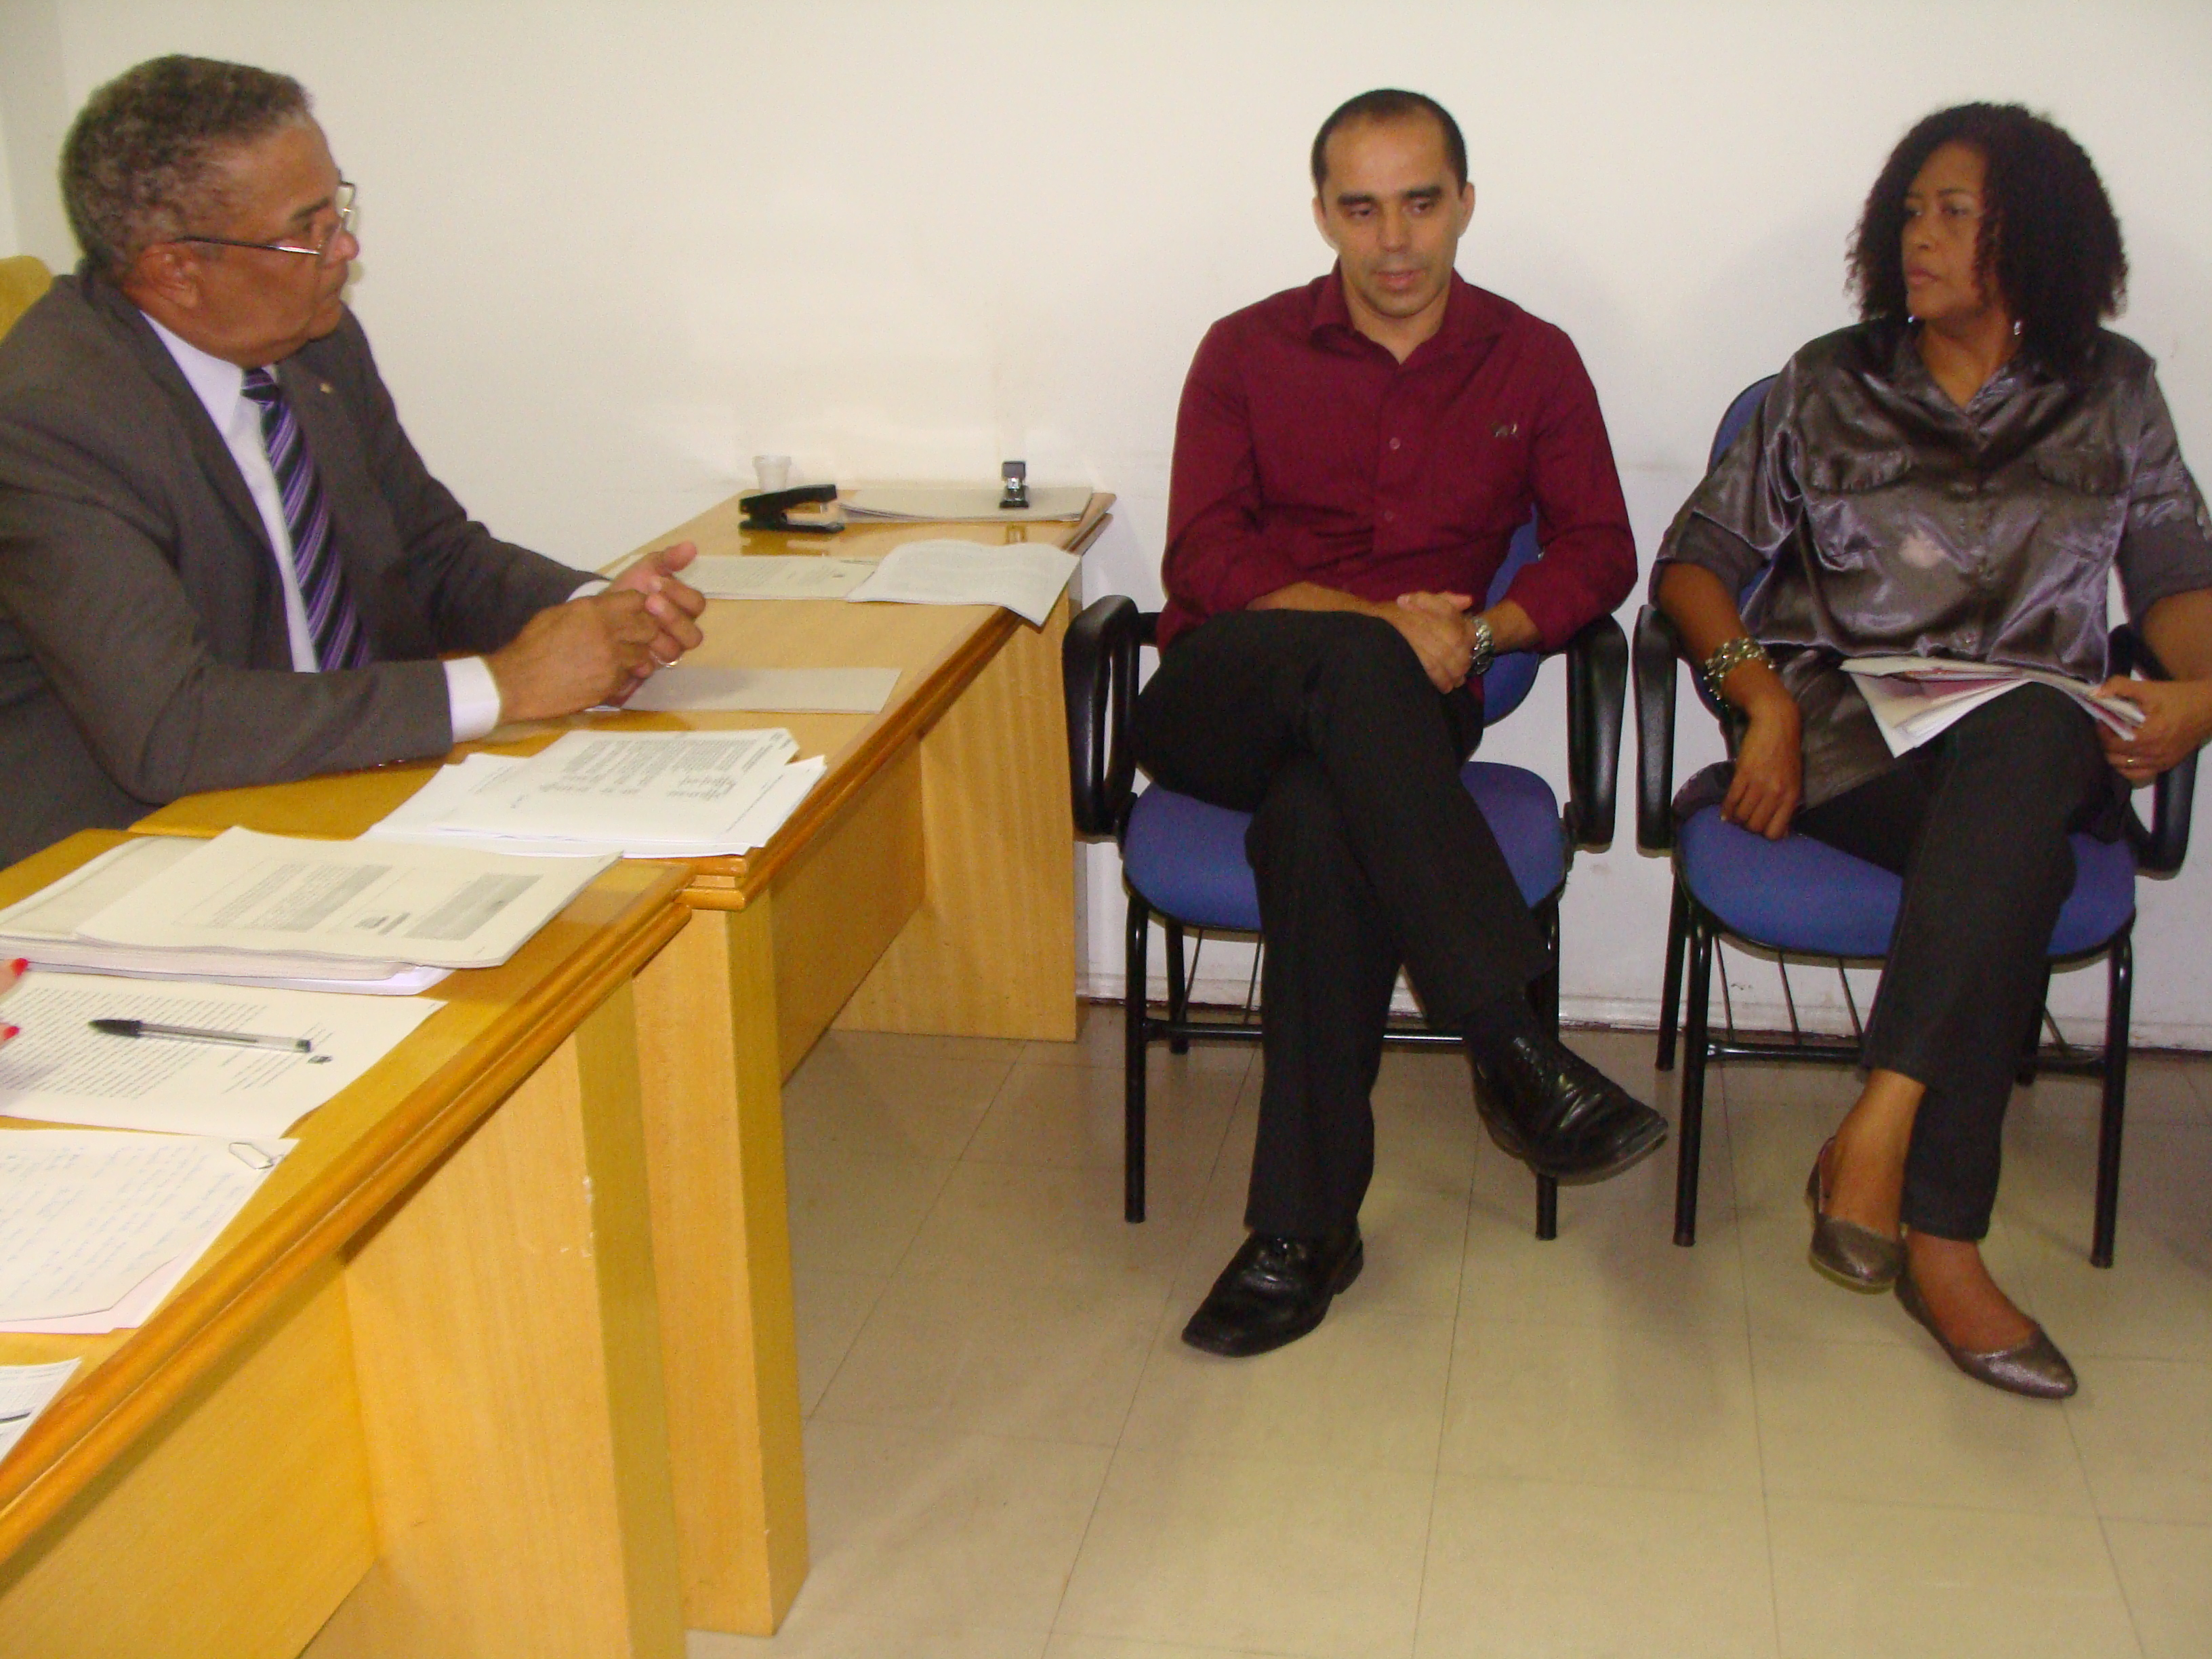 E-D Paulo Avelar, Alan Kardec e Rose Sales